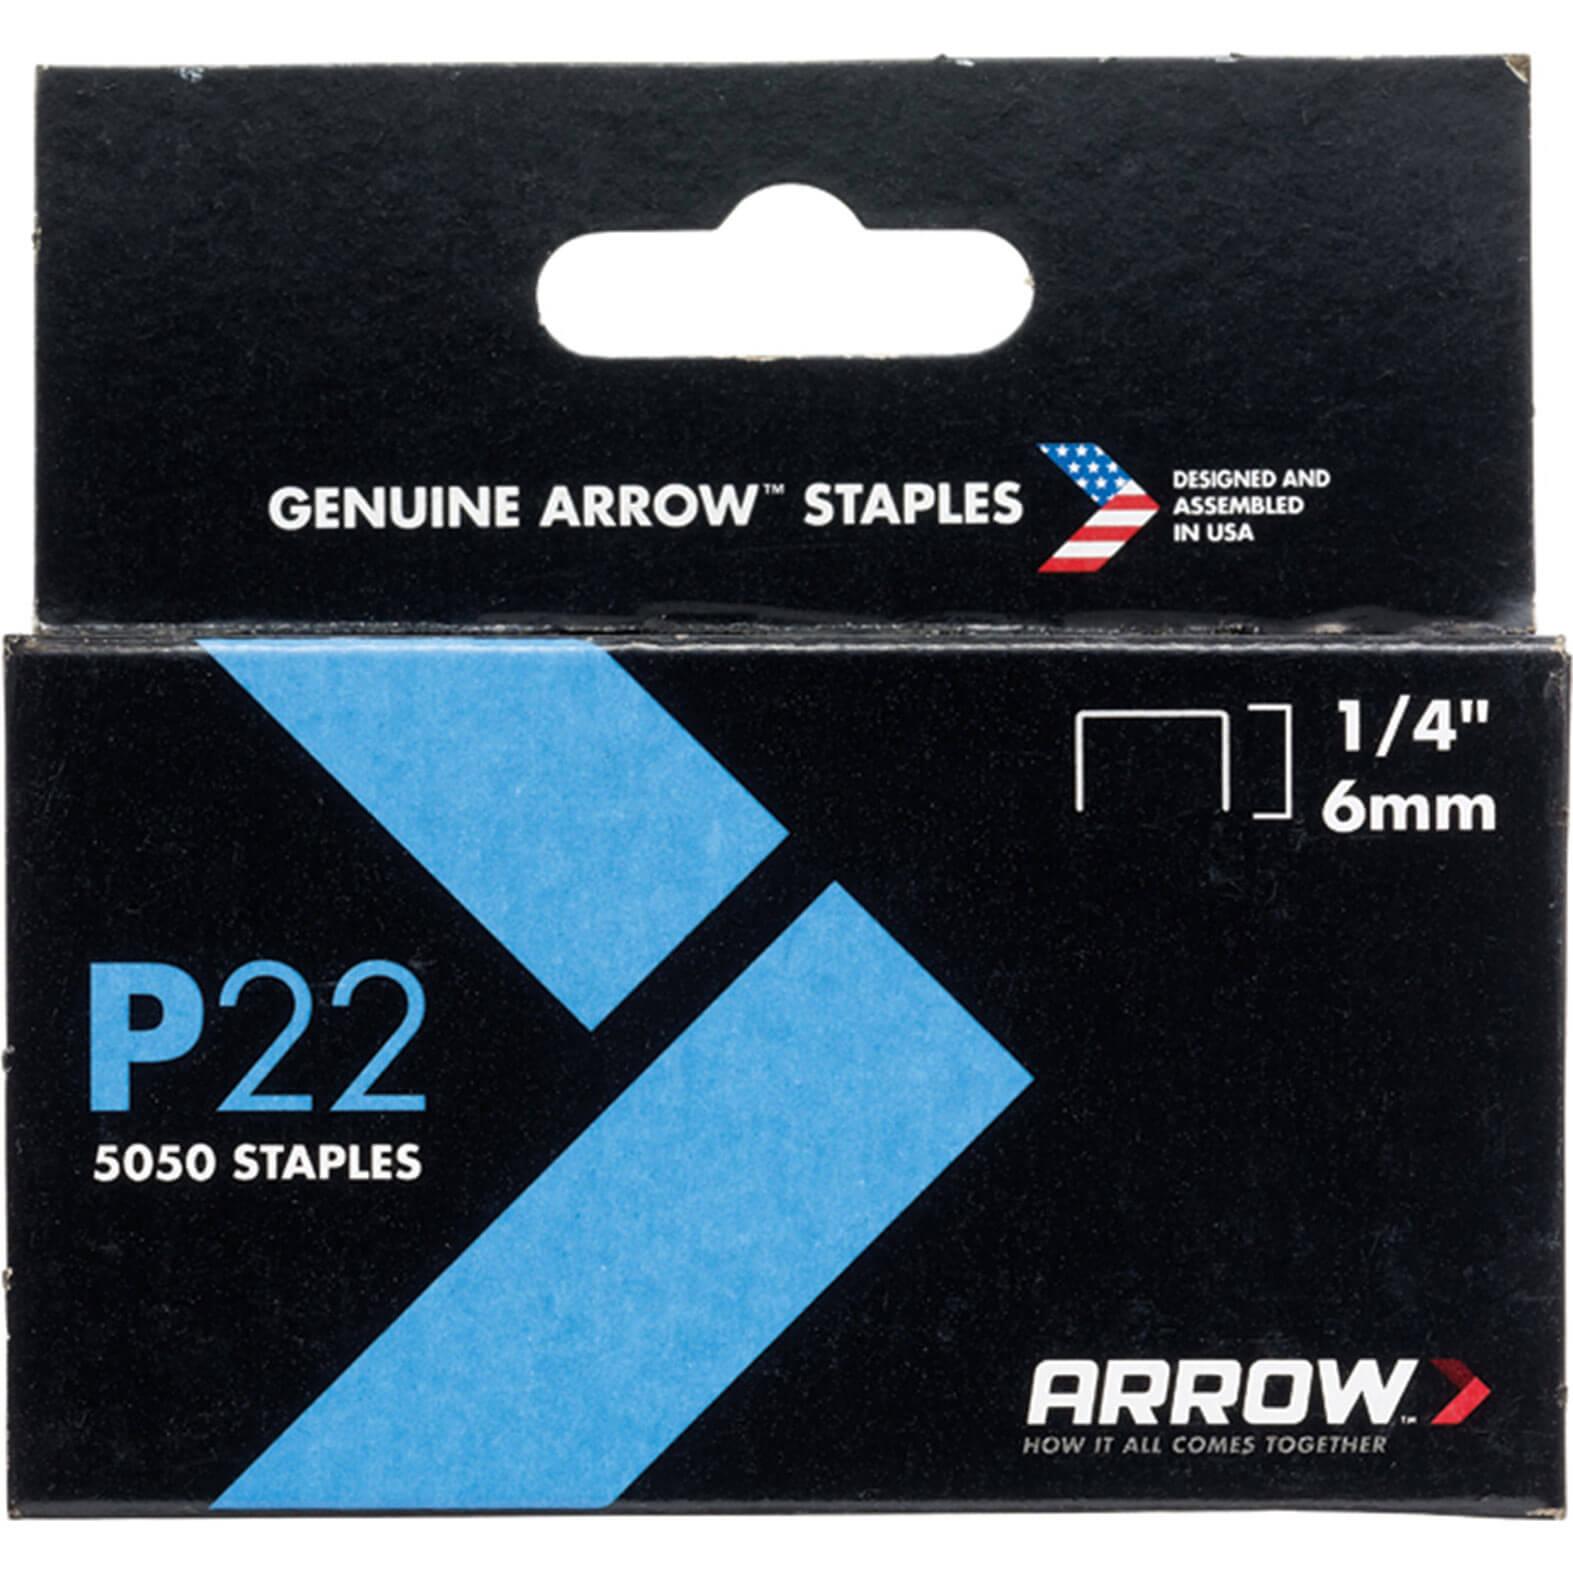 Arrow P22 Staples 6mm Pack of 5000